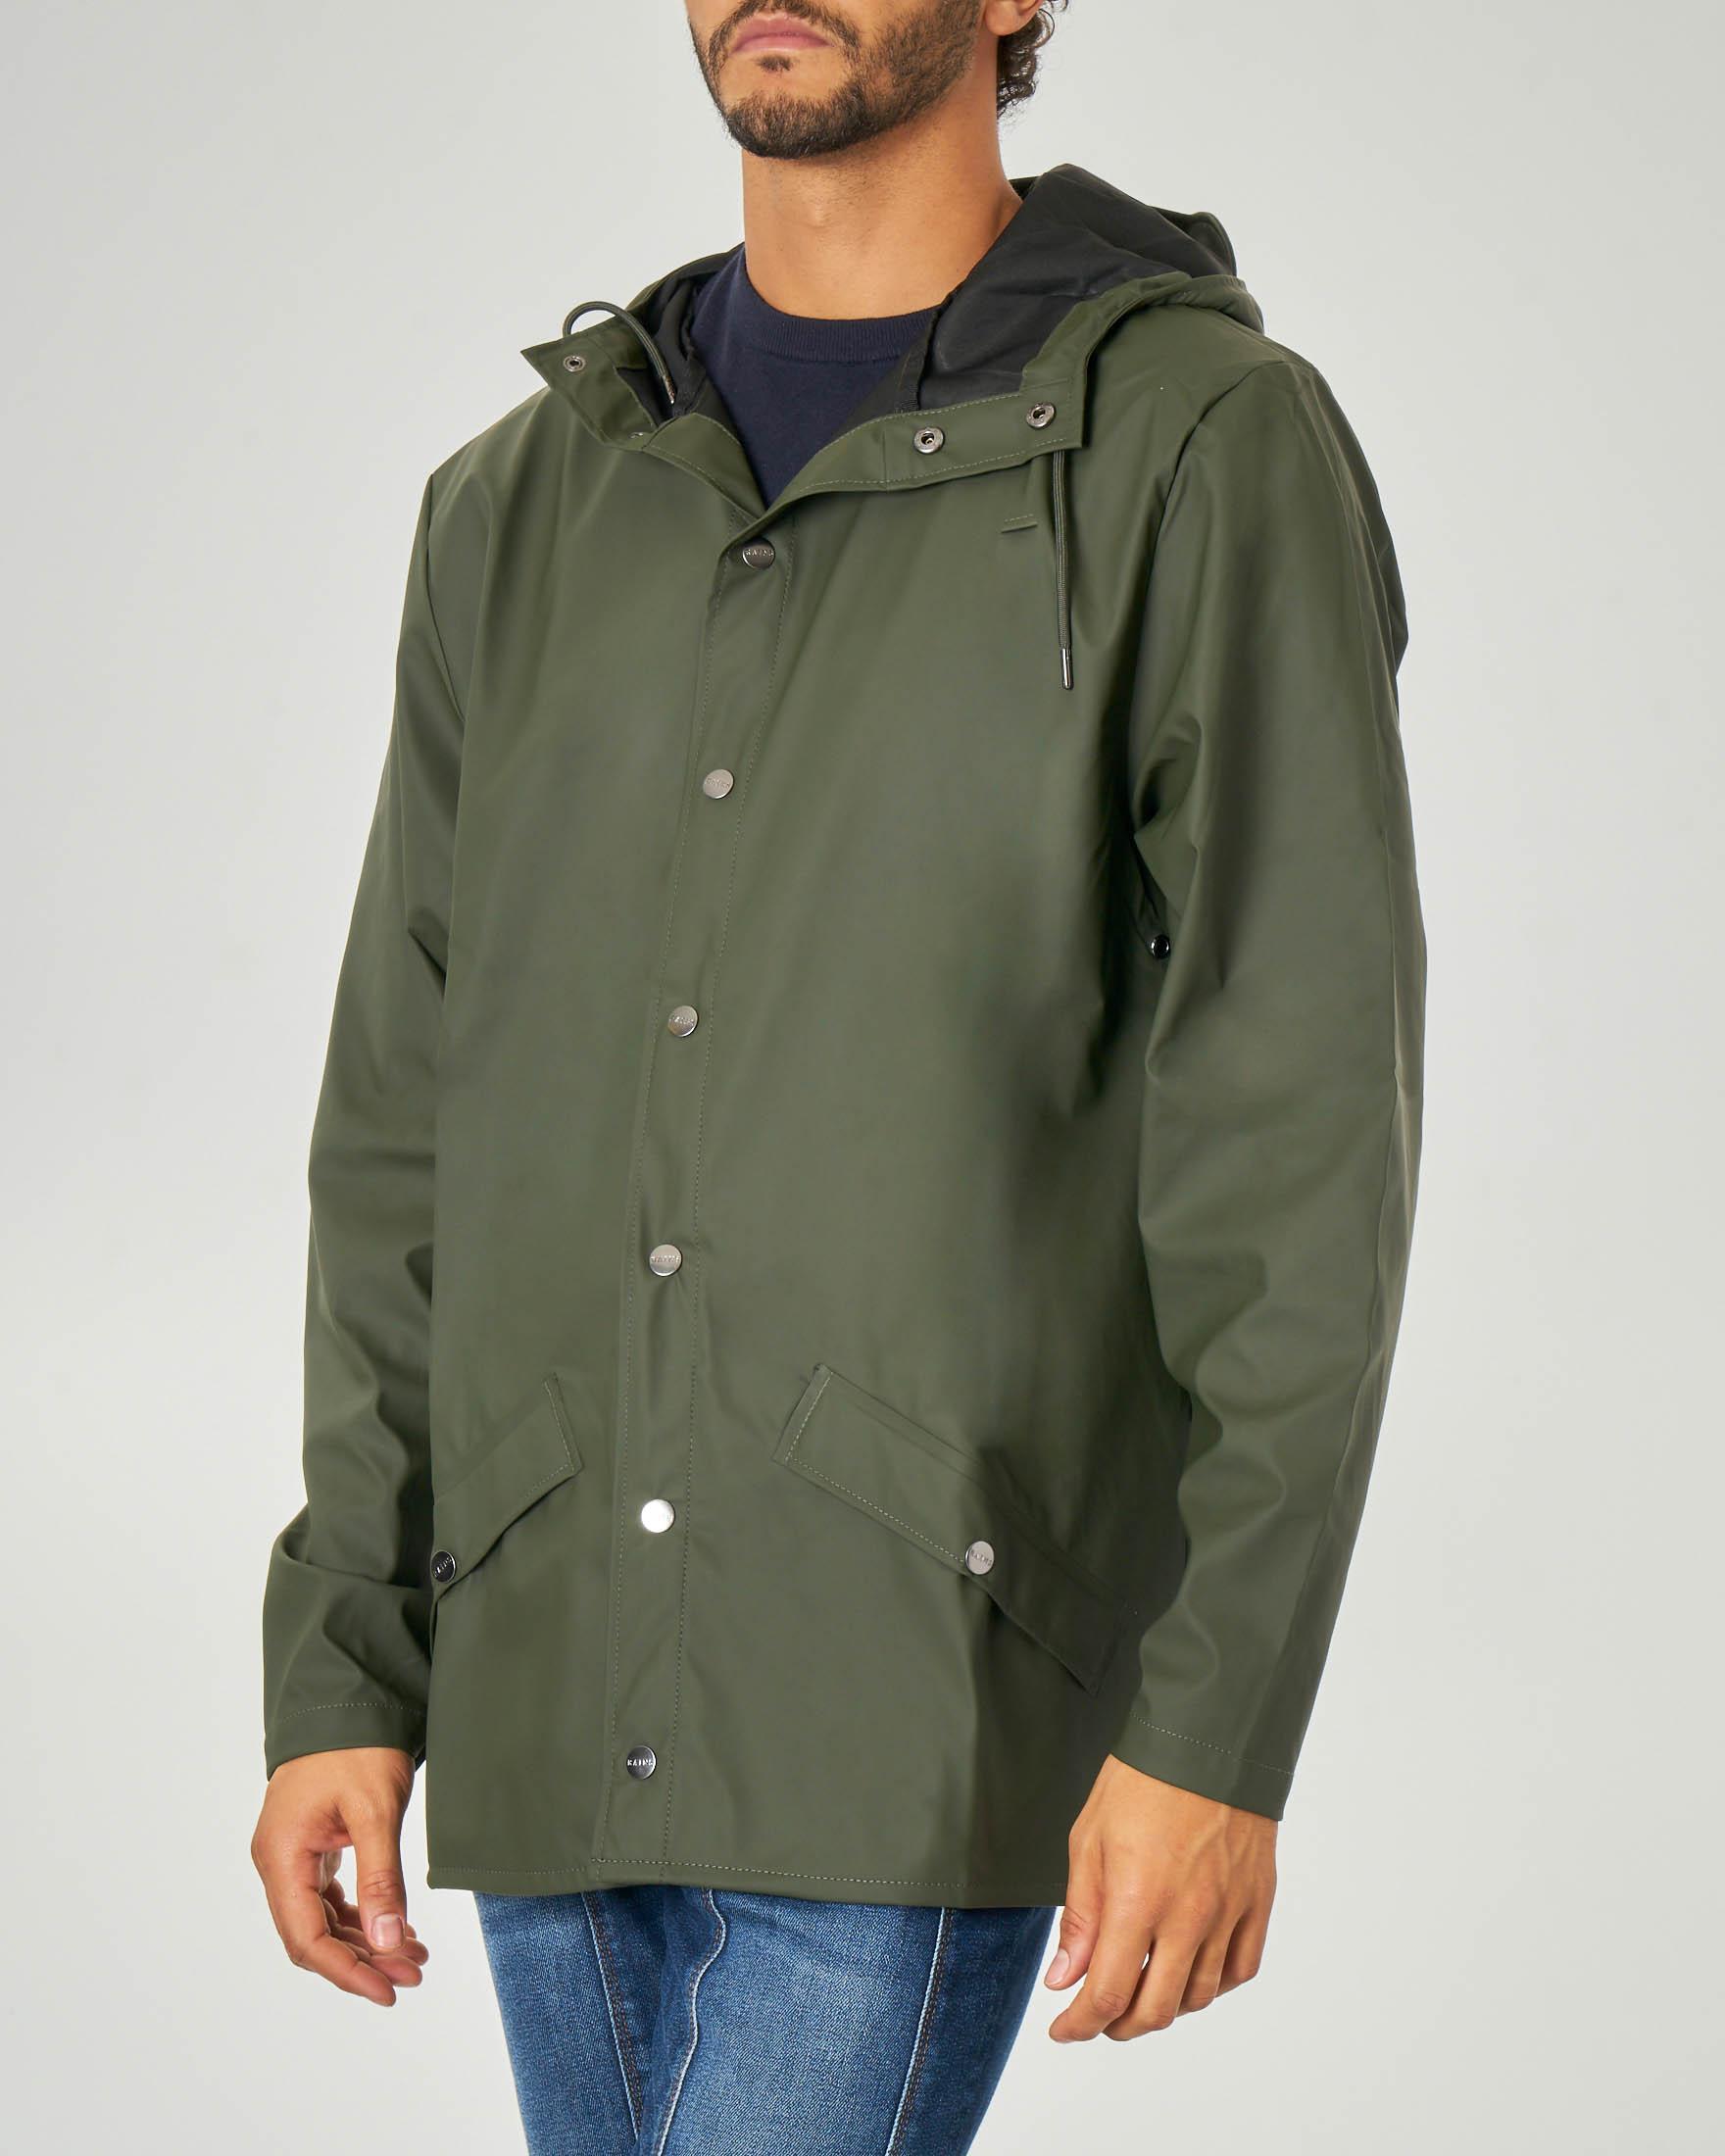 Impermeabile Jacket verde